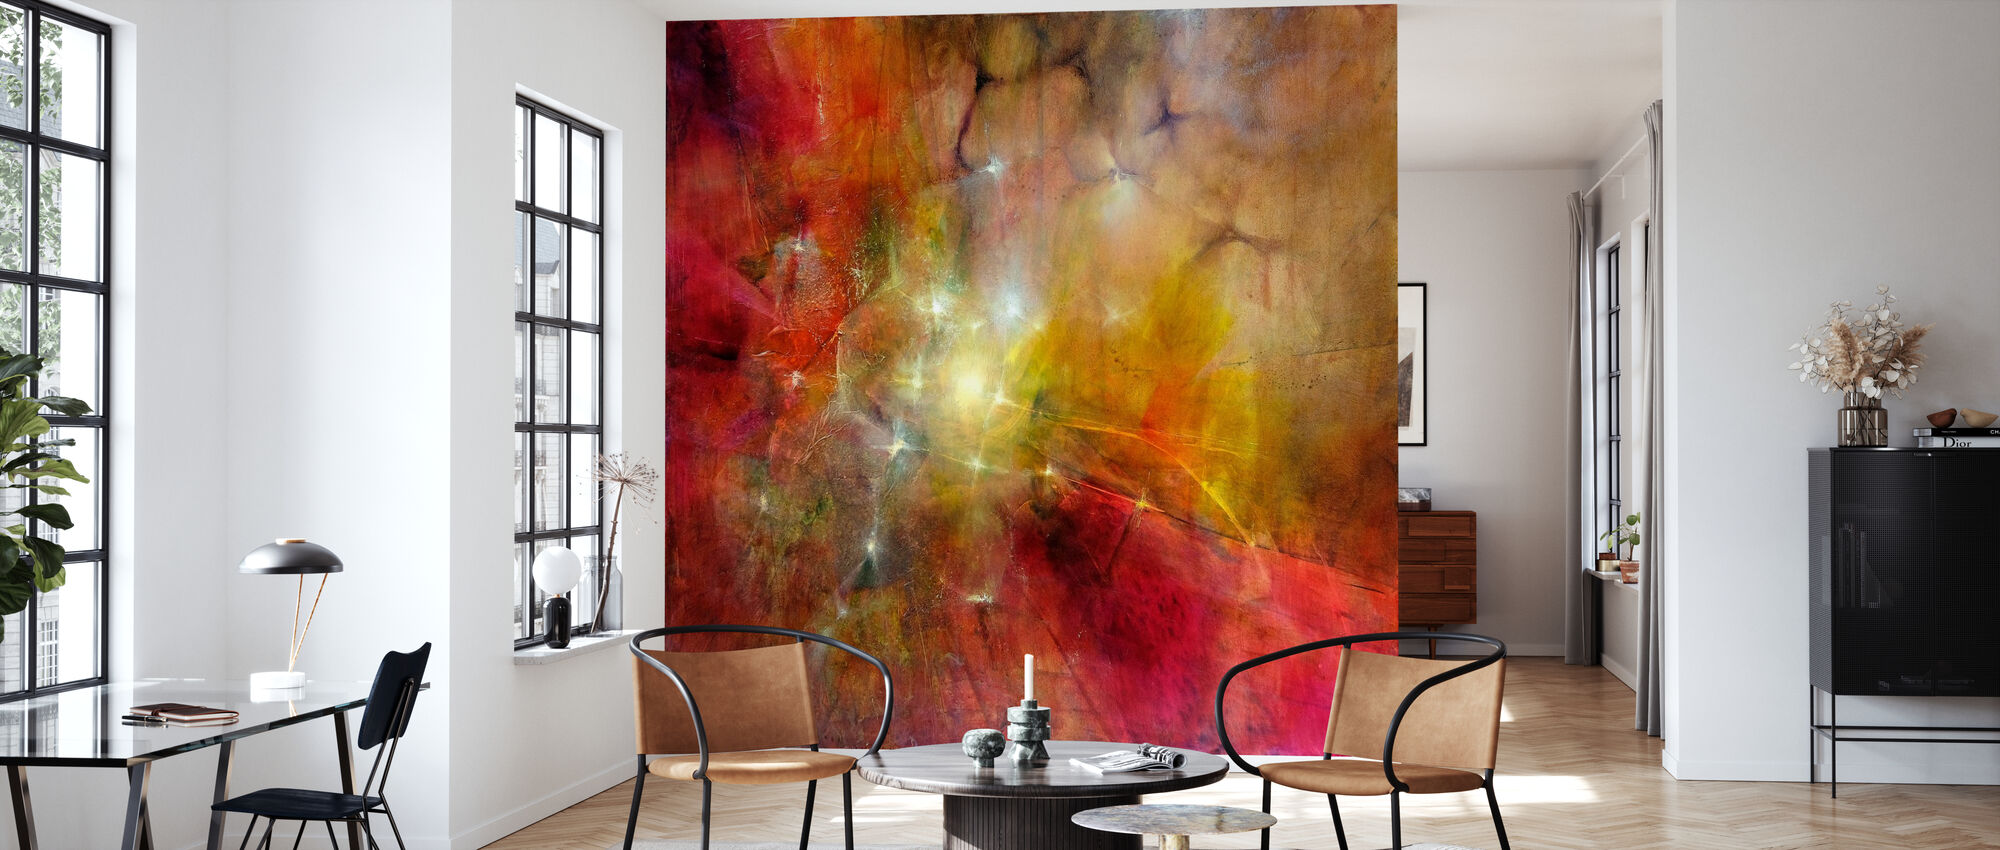 Colorado - Wallpaper - Living Room